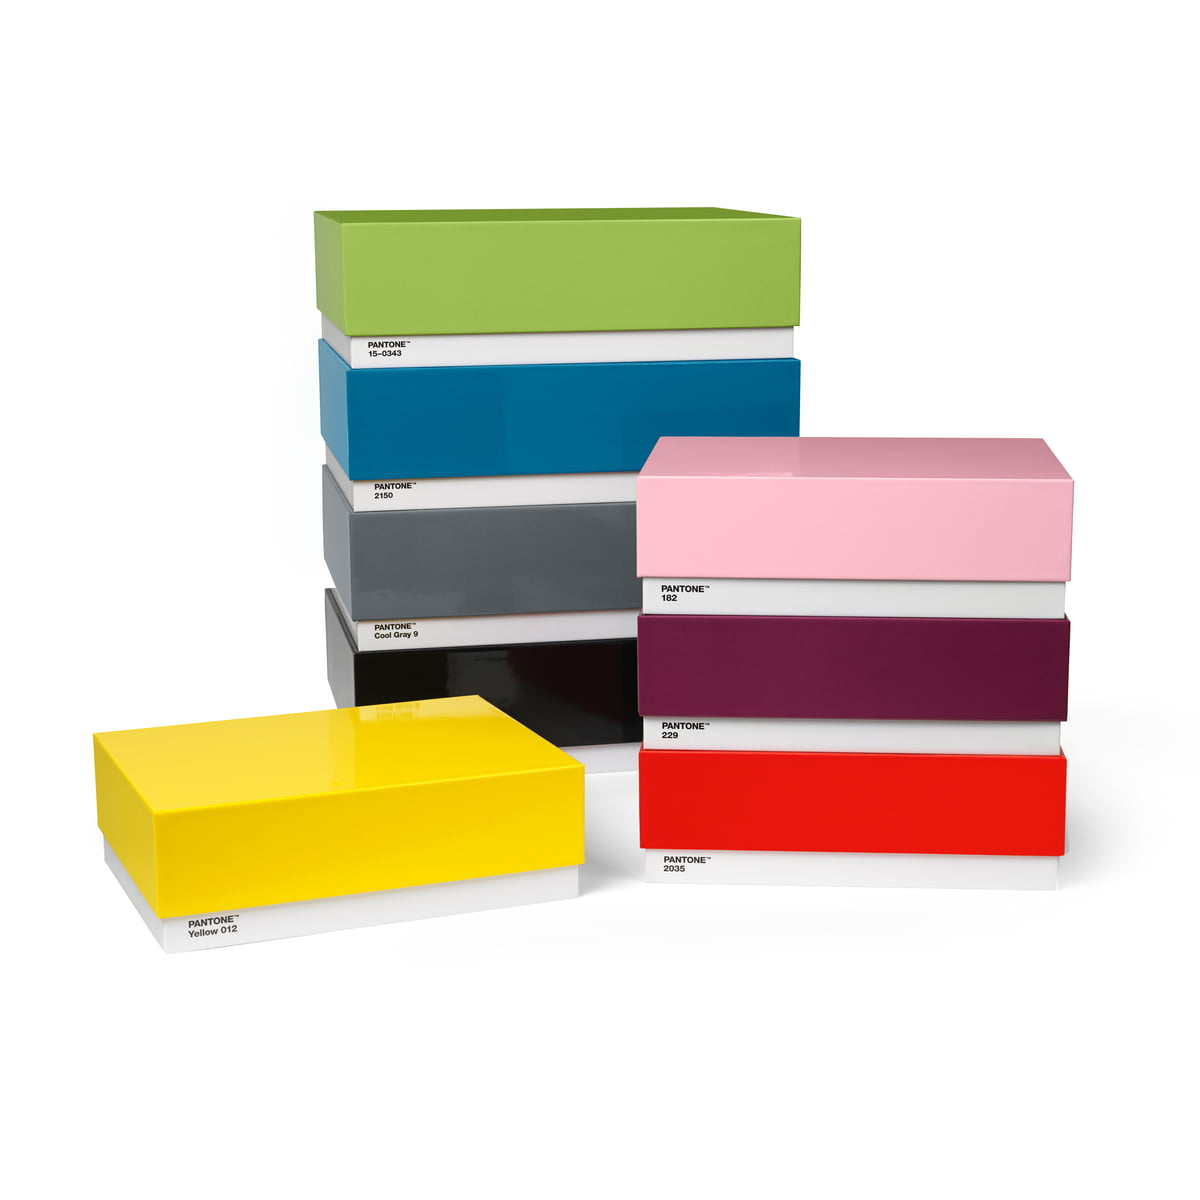 Box (Set of 44) by Pantone Universe | furniture universe uk